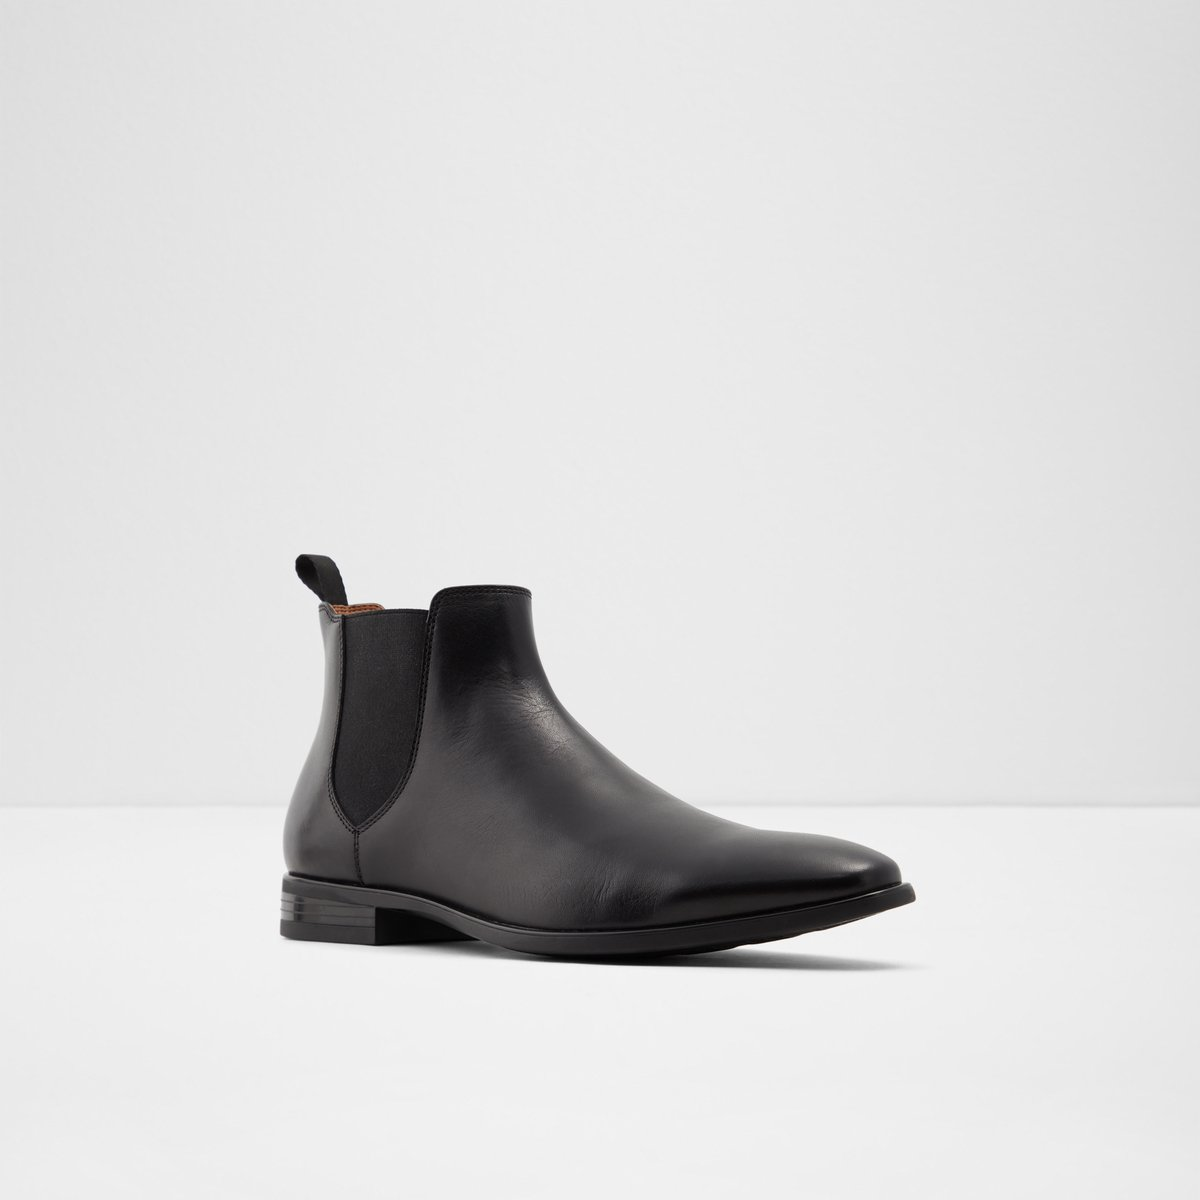 Vocien Black Men's Formal boots | ALDO UK